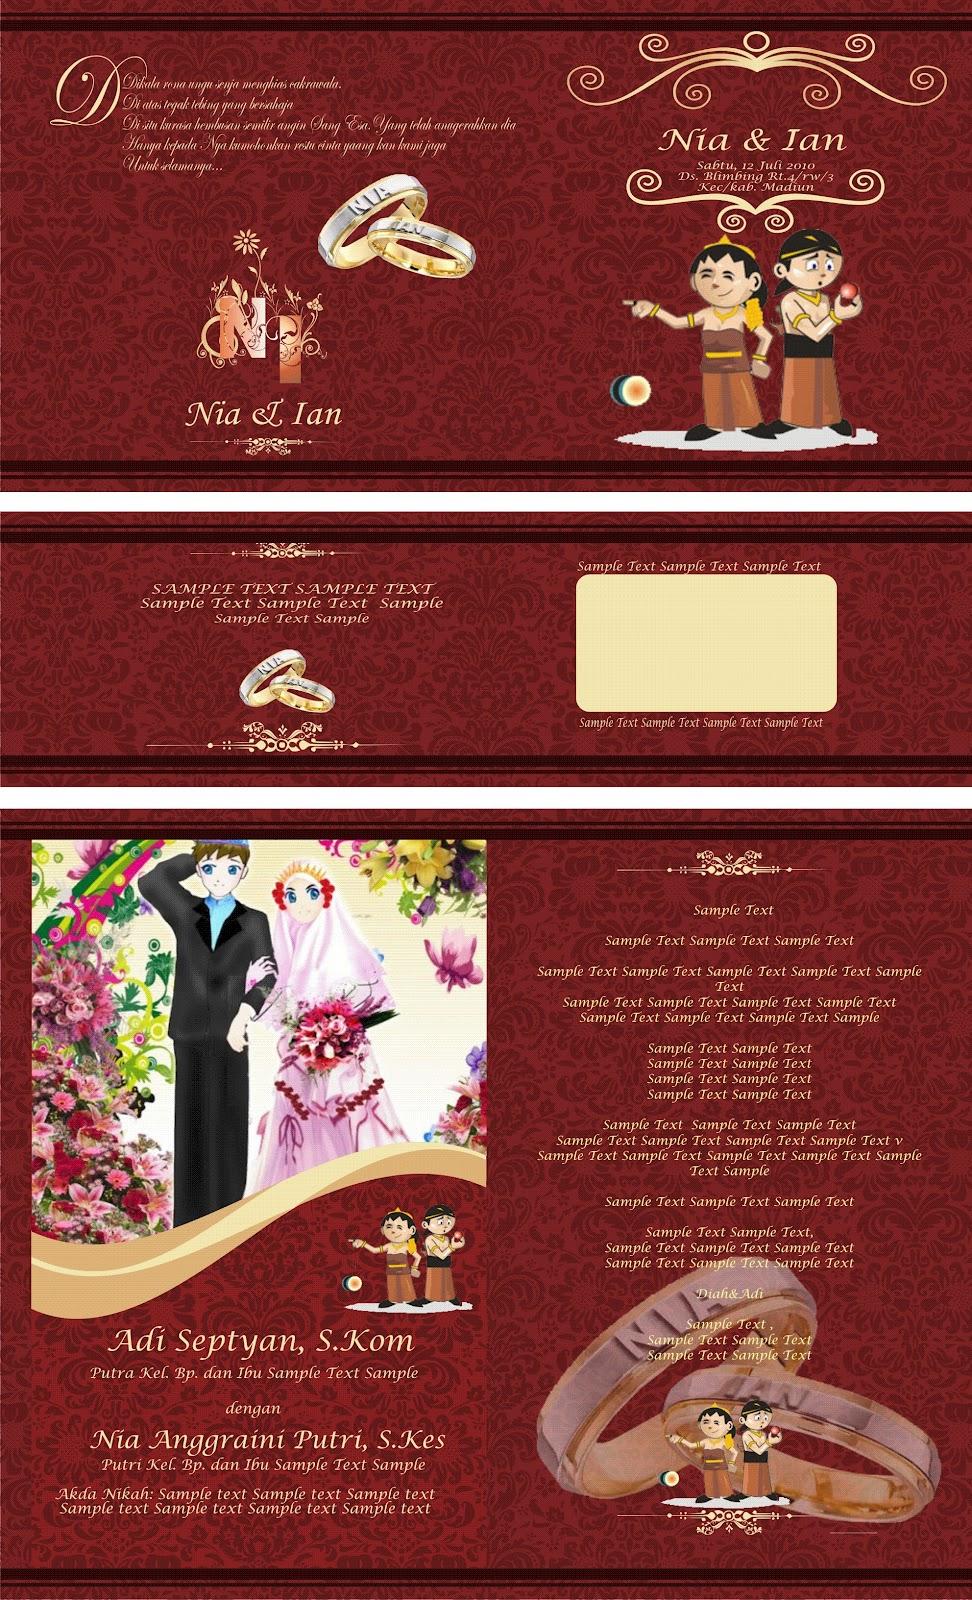 undangan ulem tampak luar sragen minggu 7 april 2013 desain undangan ...